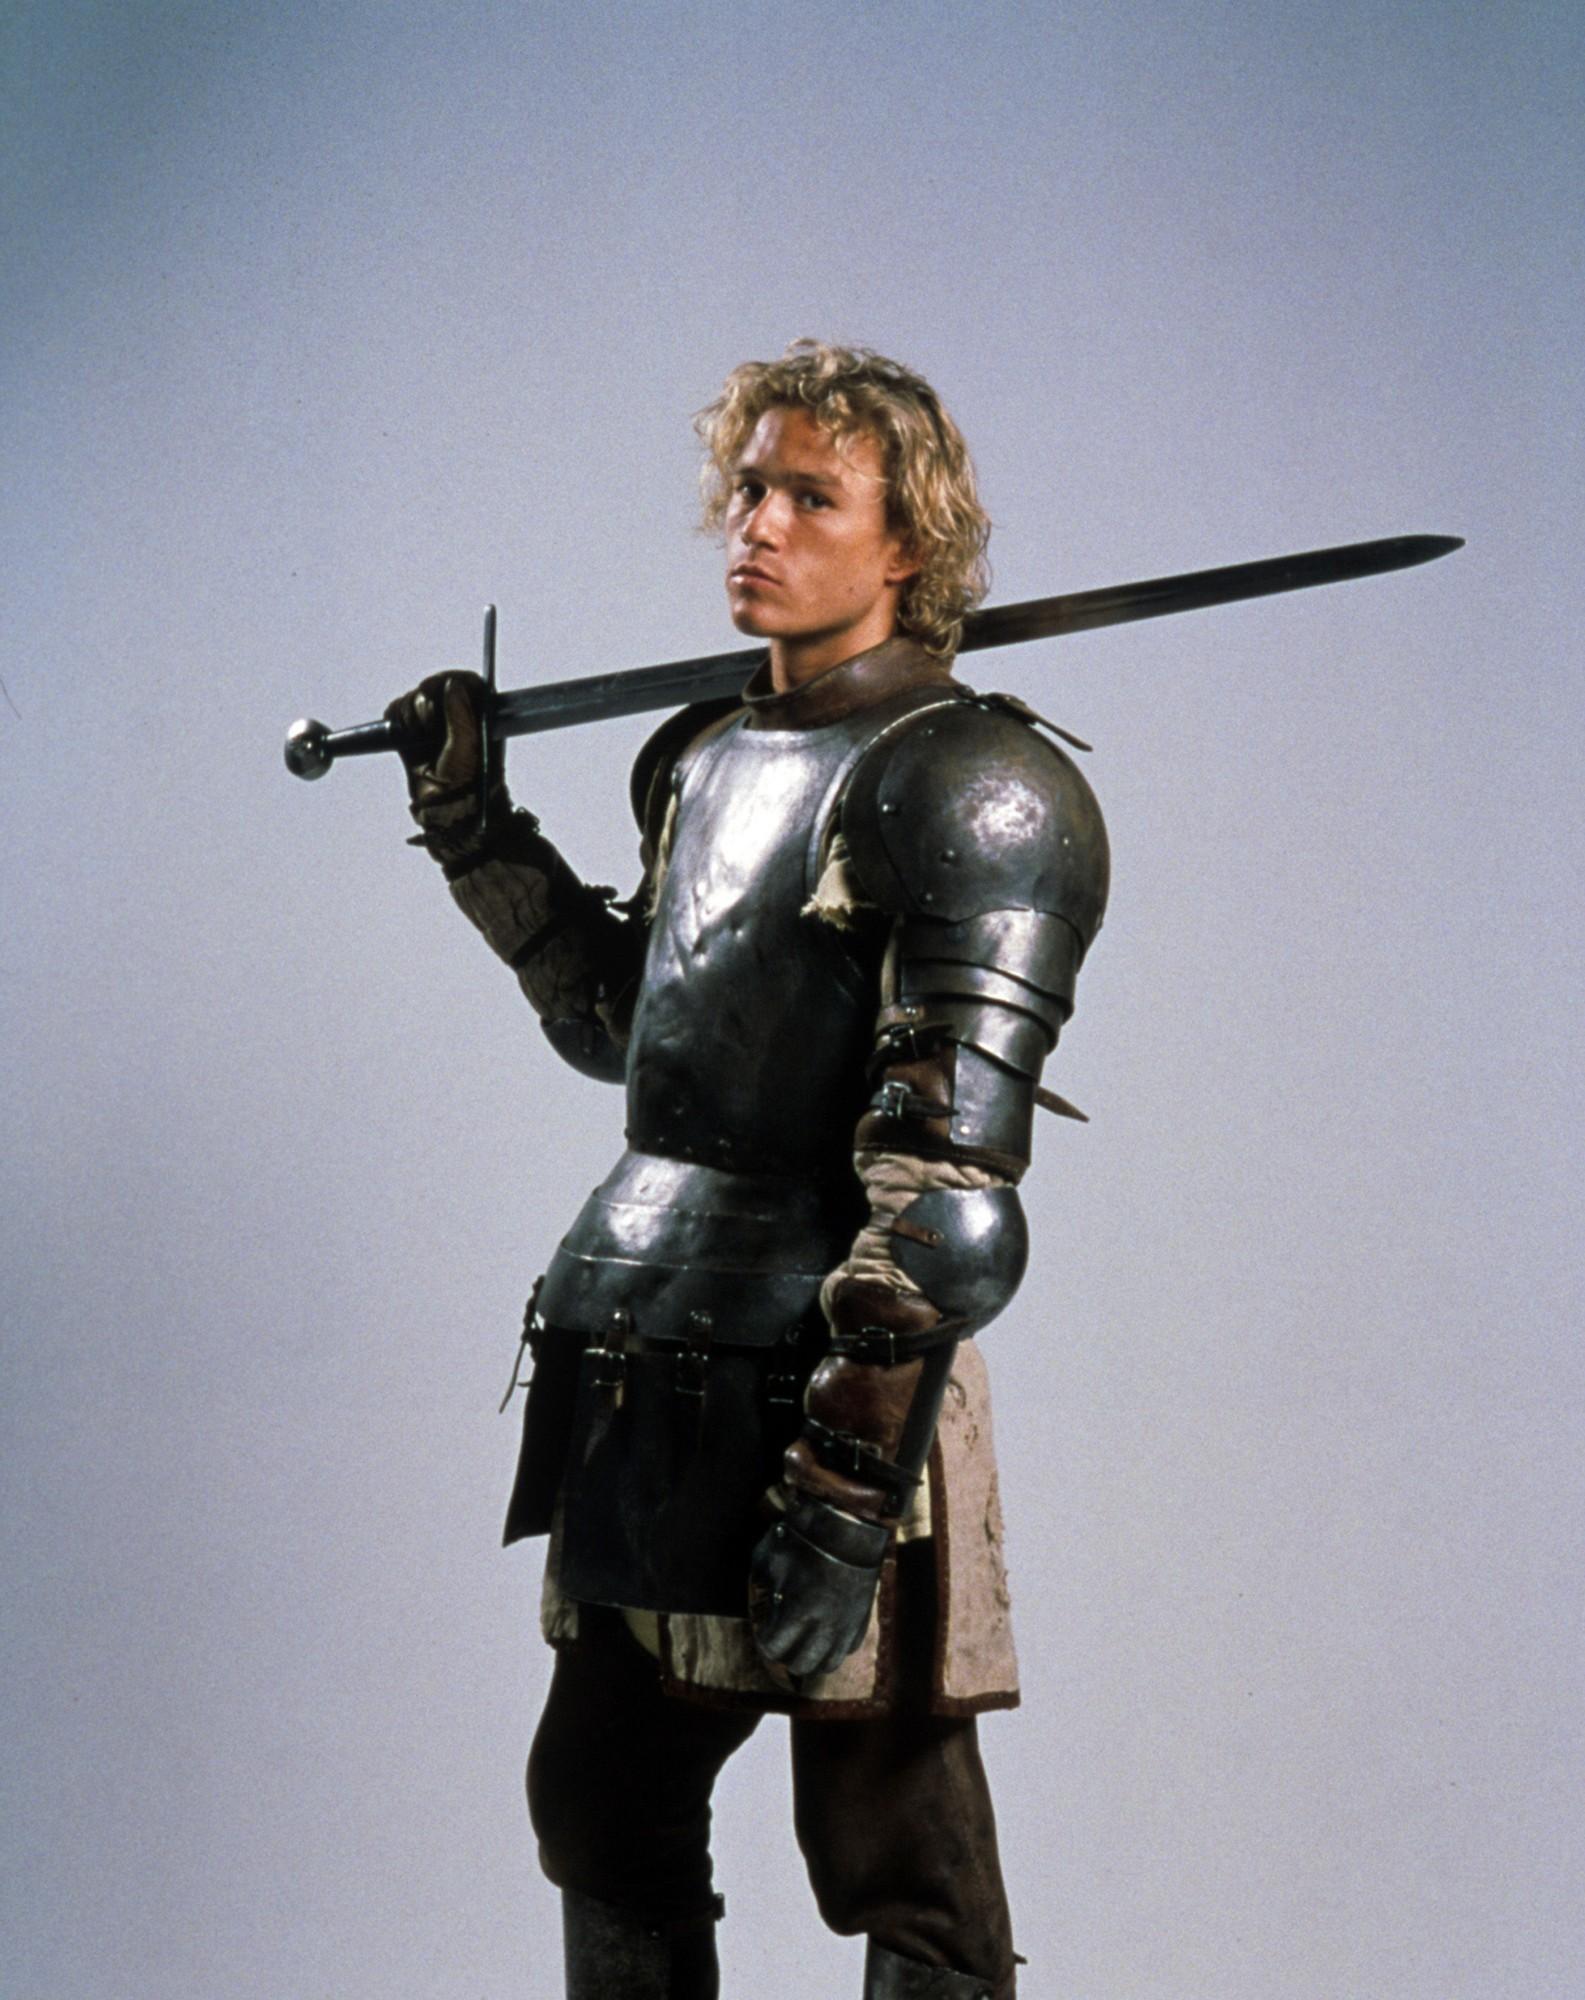 1000+ images about Heath Ledger on Pinterest | Heath ...